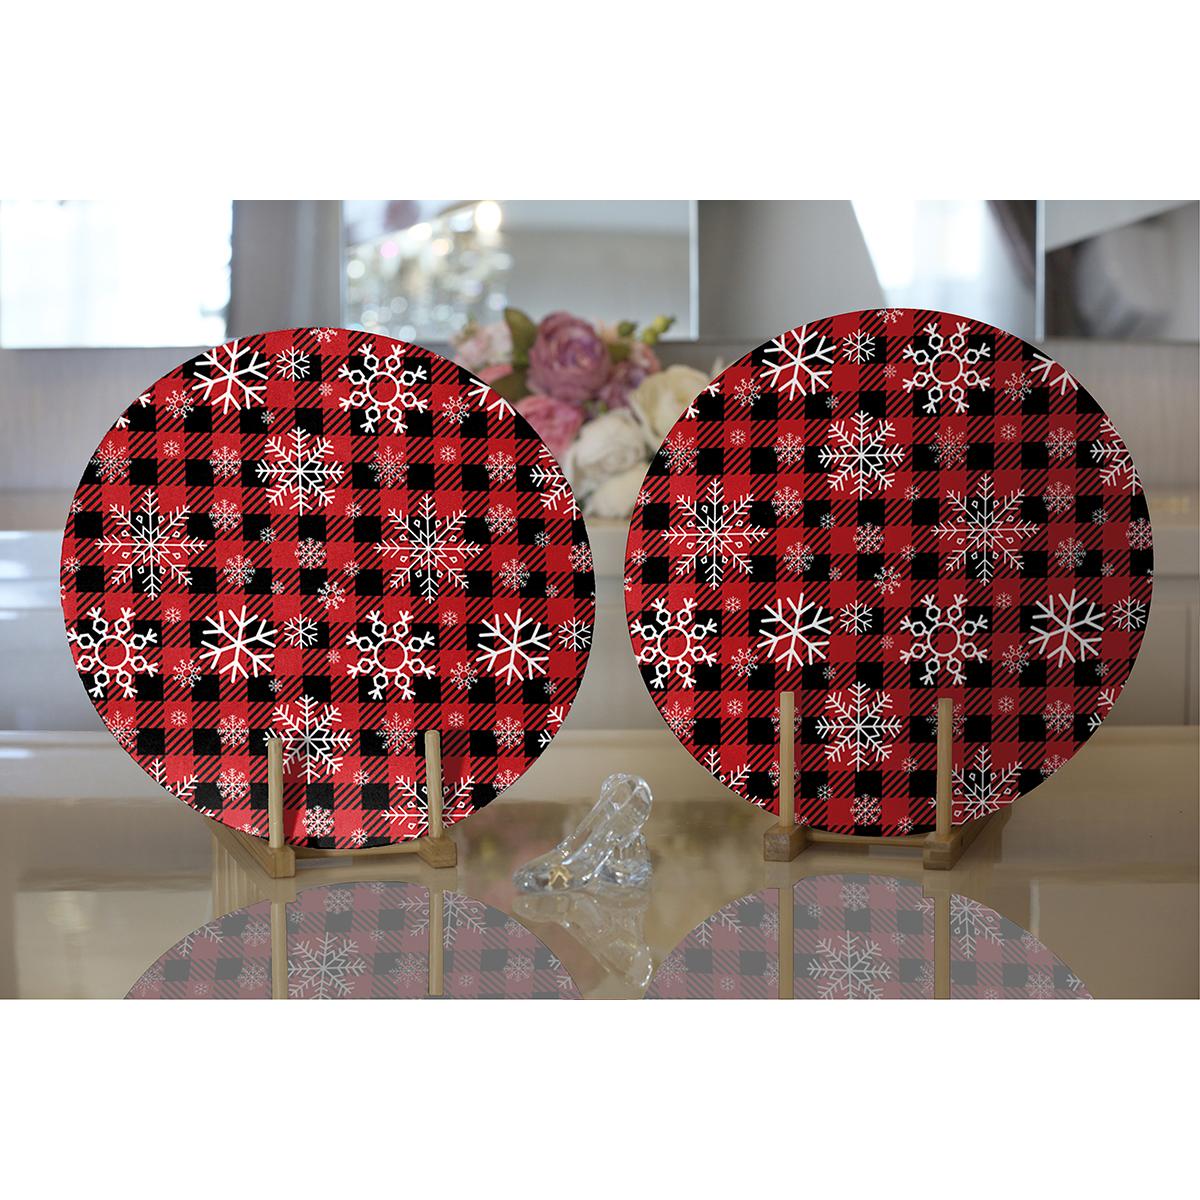 Realhomes Kırmızı Ekose Desenli Kartanesi Motifli Dijital Baskılı Modern 2'li Yuvarlak Servis Altlığı - Supla Realhomes